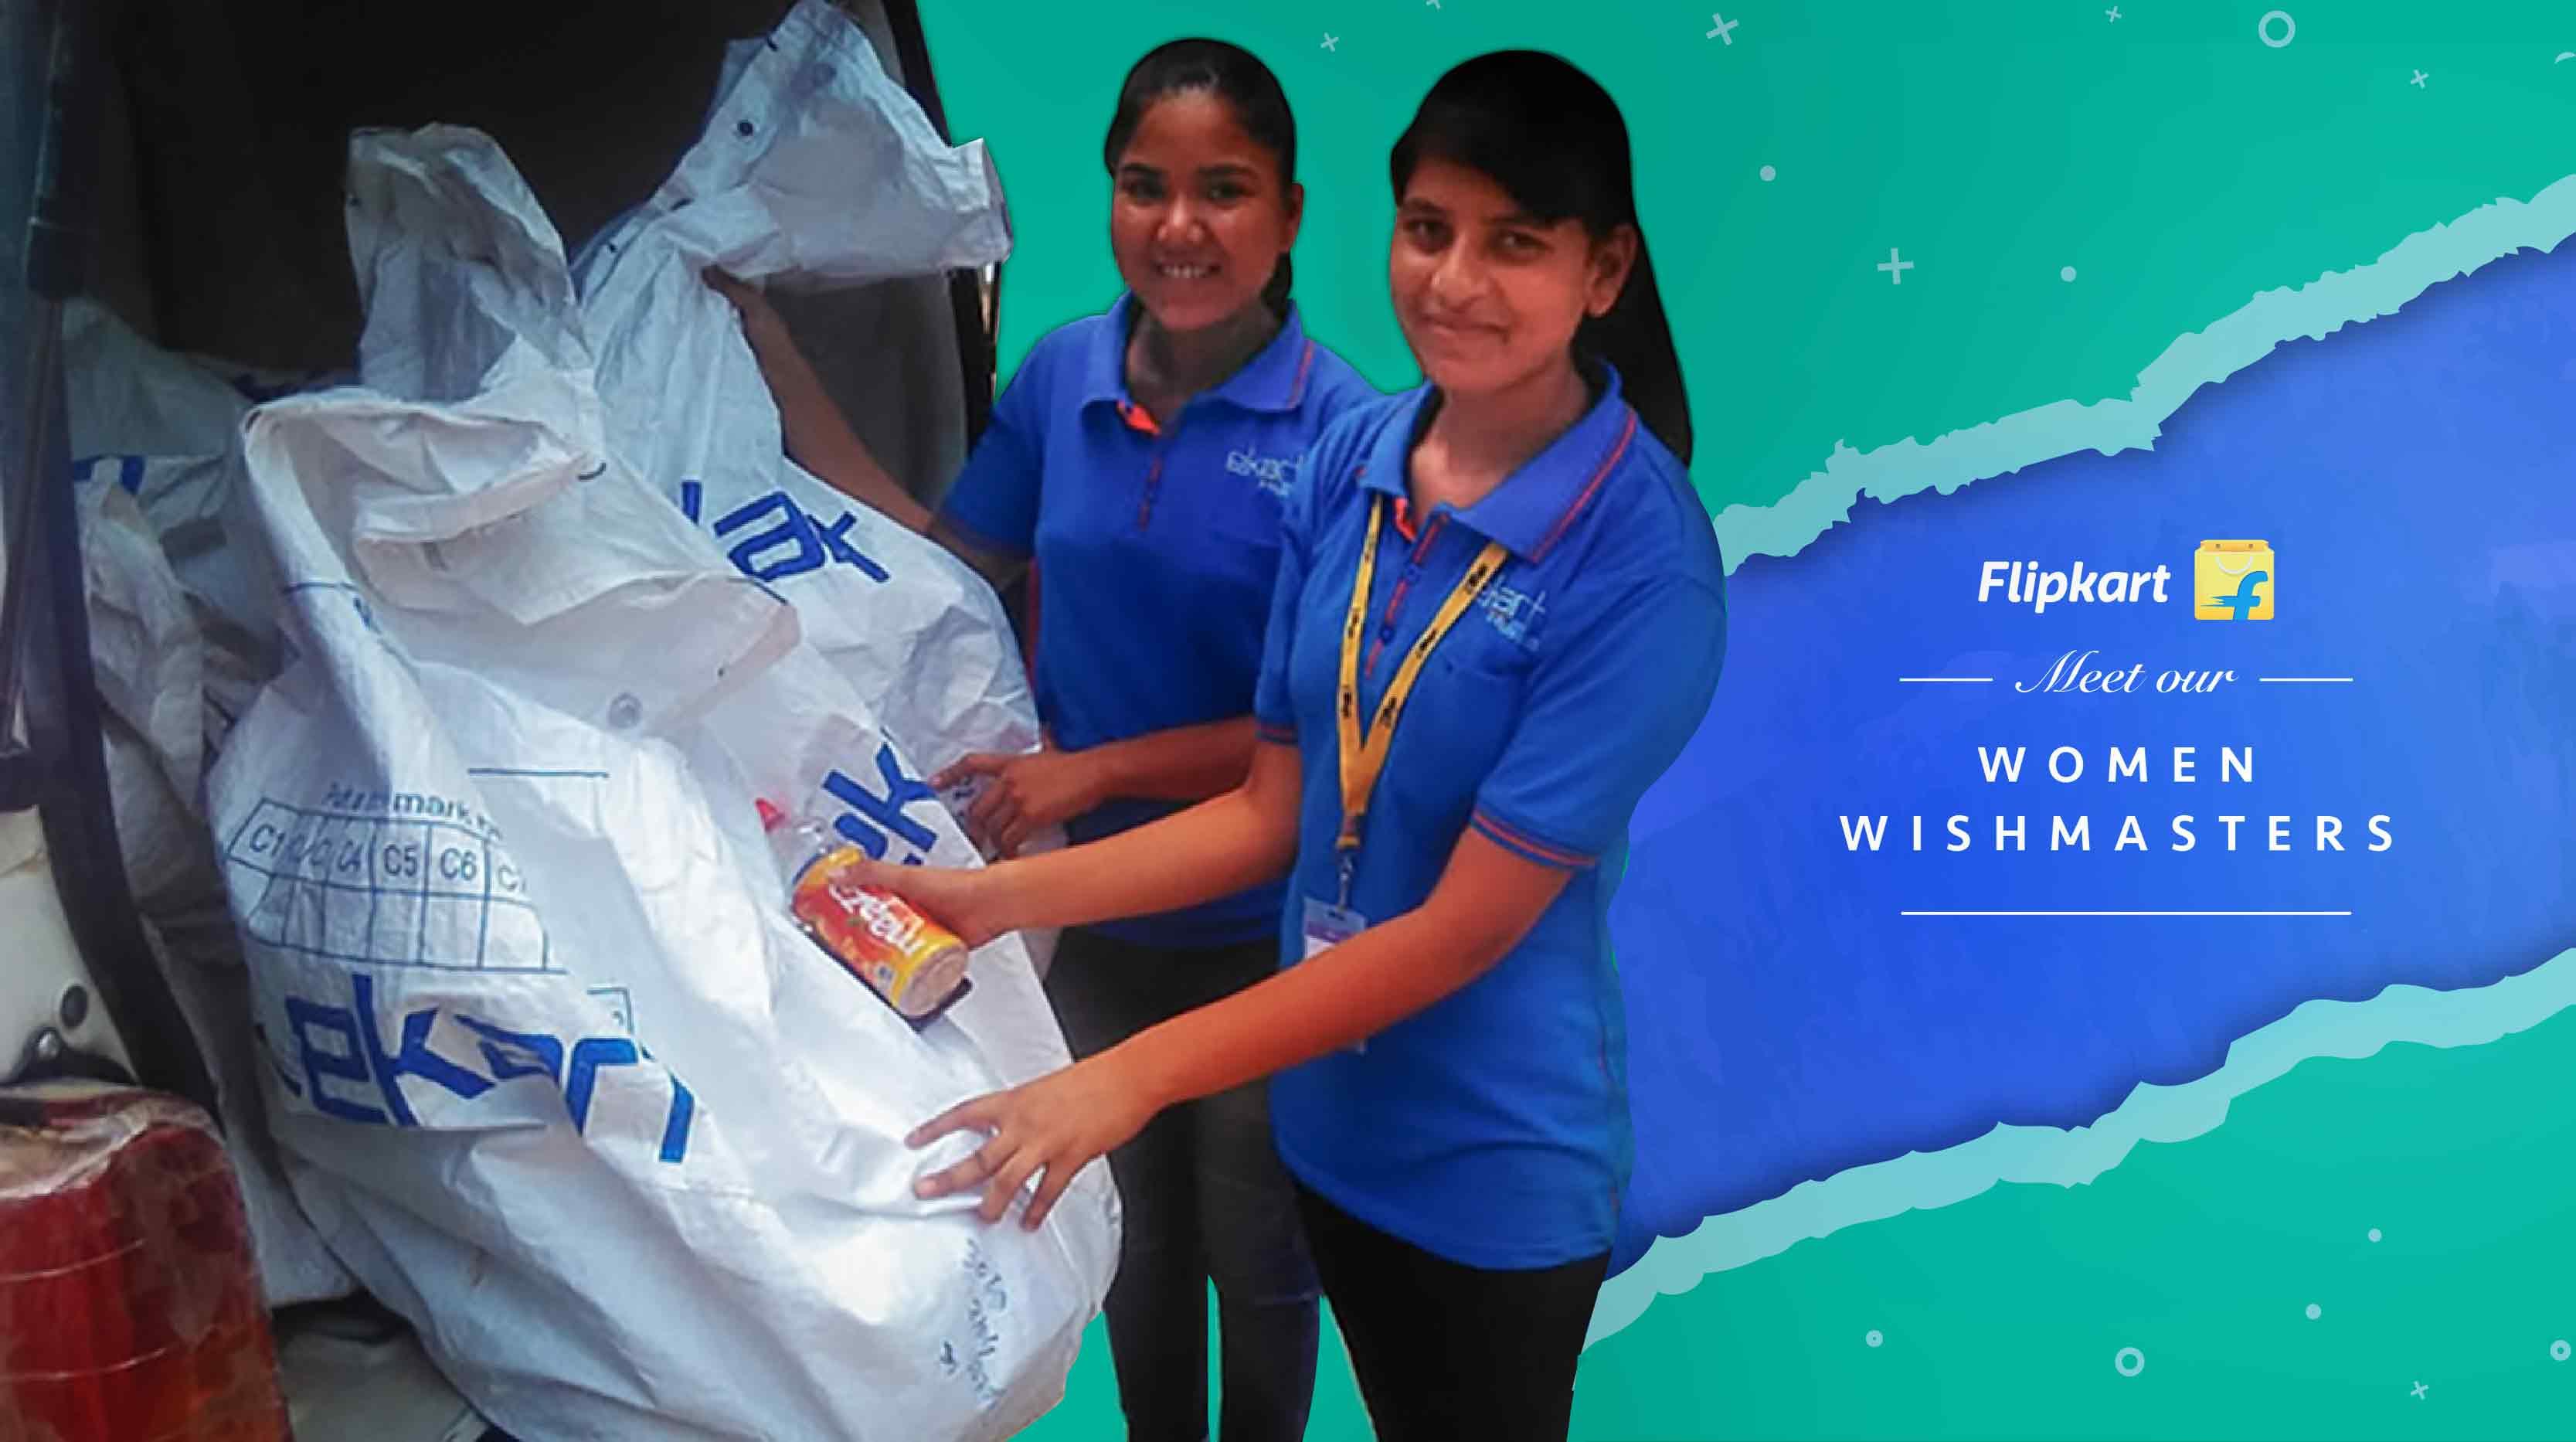 Flipkart's women in blue – meet the Wishmasters bringing joy to Gurugram!